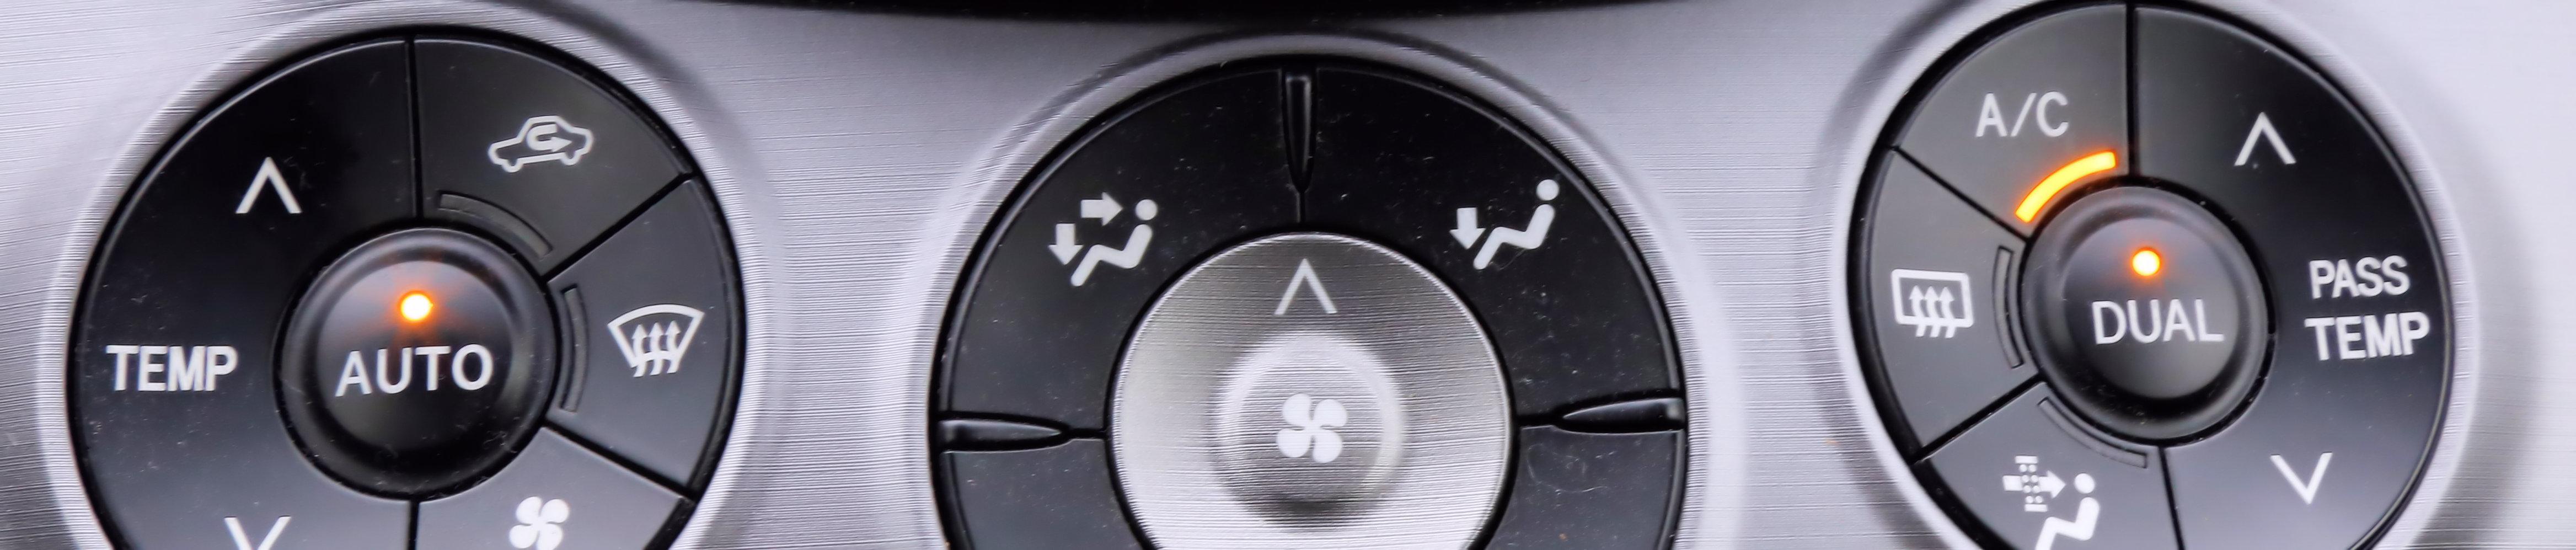 Car Cool Systems gratis airco reiniging ACTIE